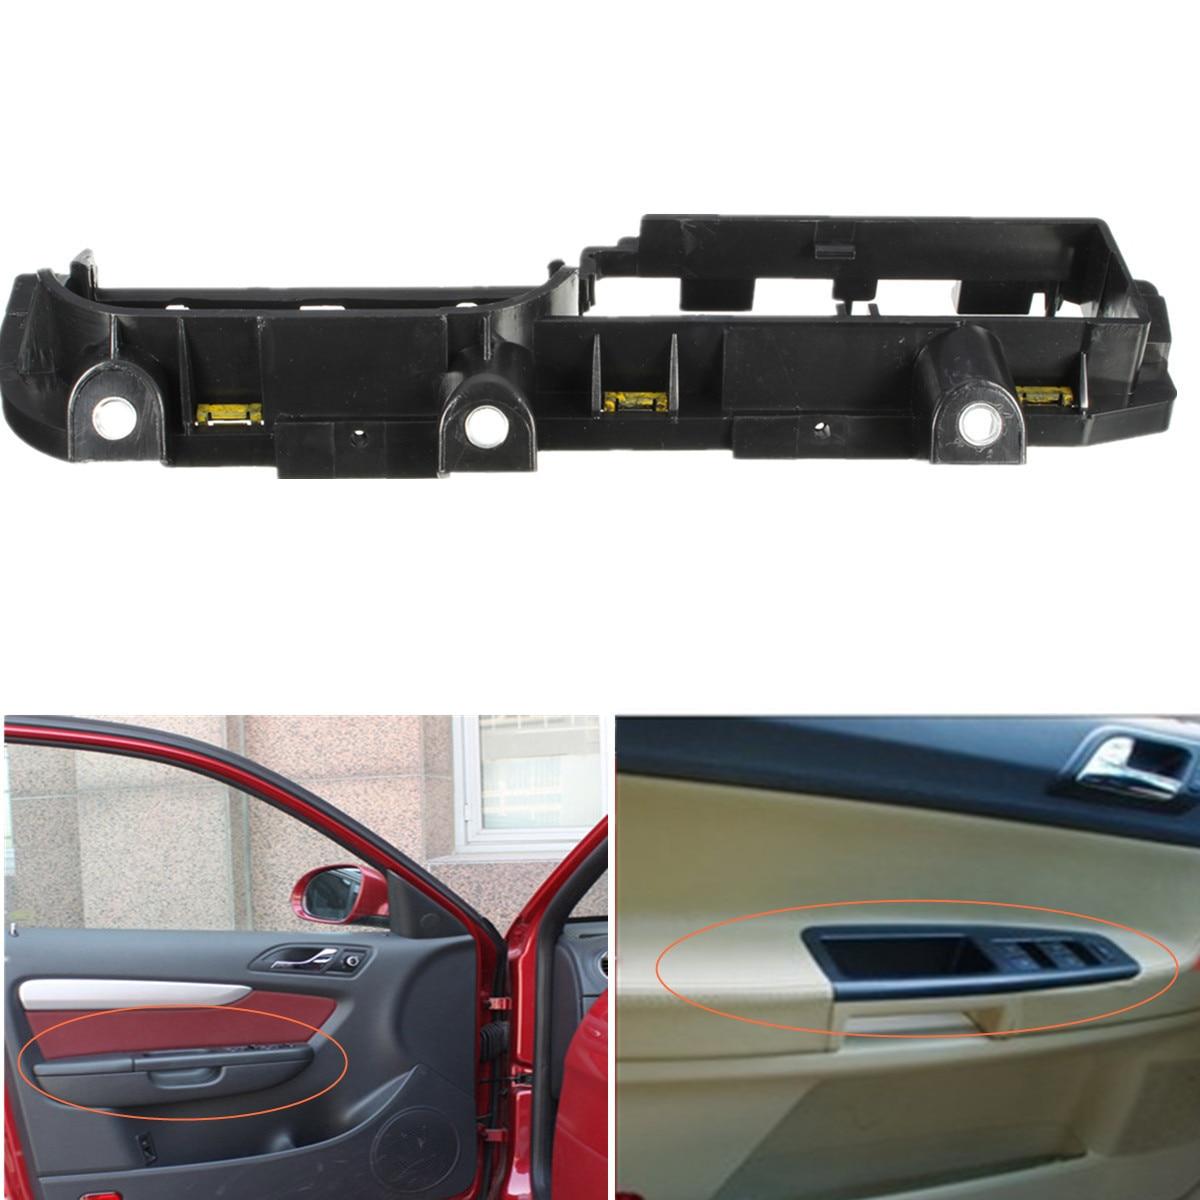 Передний левый Драйвер межкомнатной двери Натяжной кронштейн для ручки 1J1867179A для VW Jetta Bora Golf MK4 1999-2001 2002 2003 2004 2005